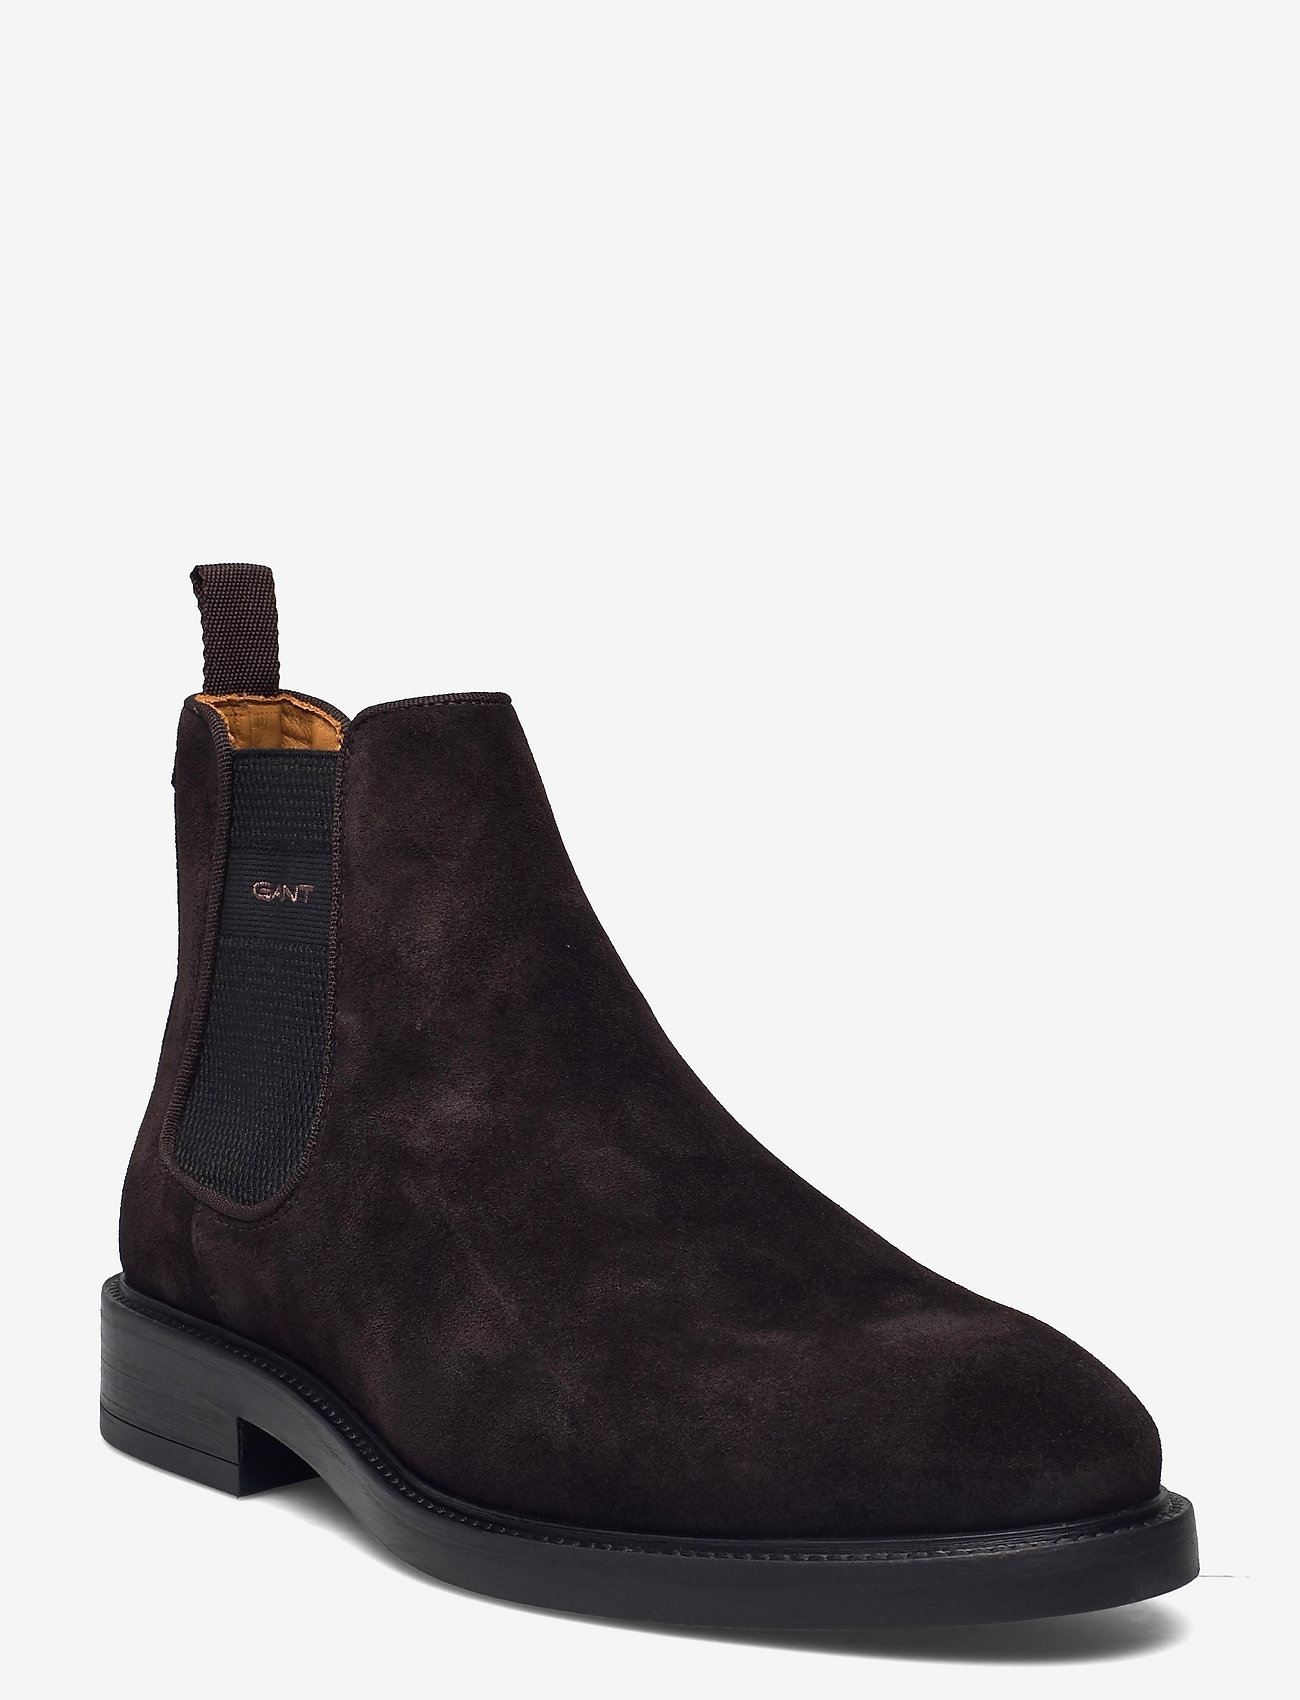 GANT - Flairville Chelsea - chelsea boots - dark brown - 0